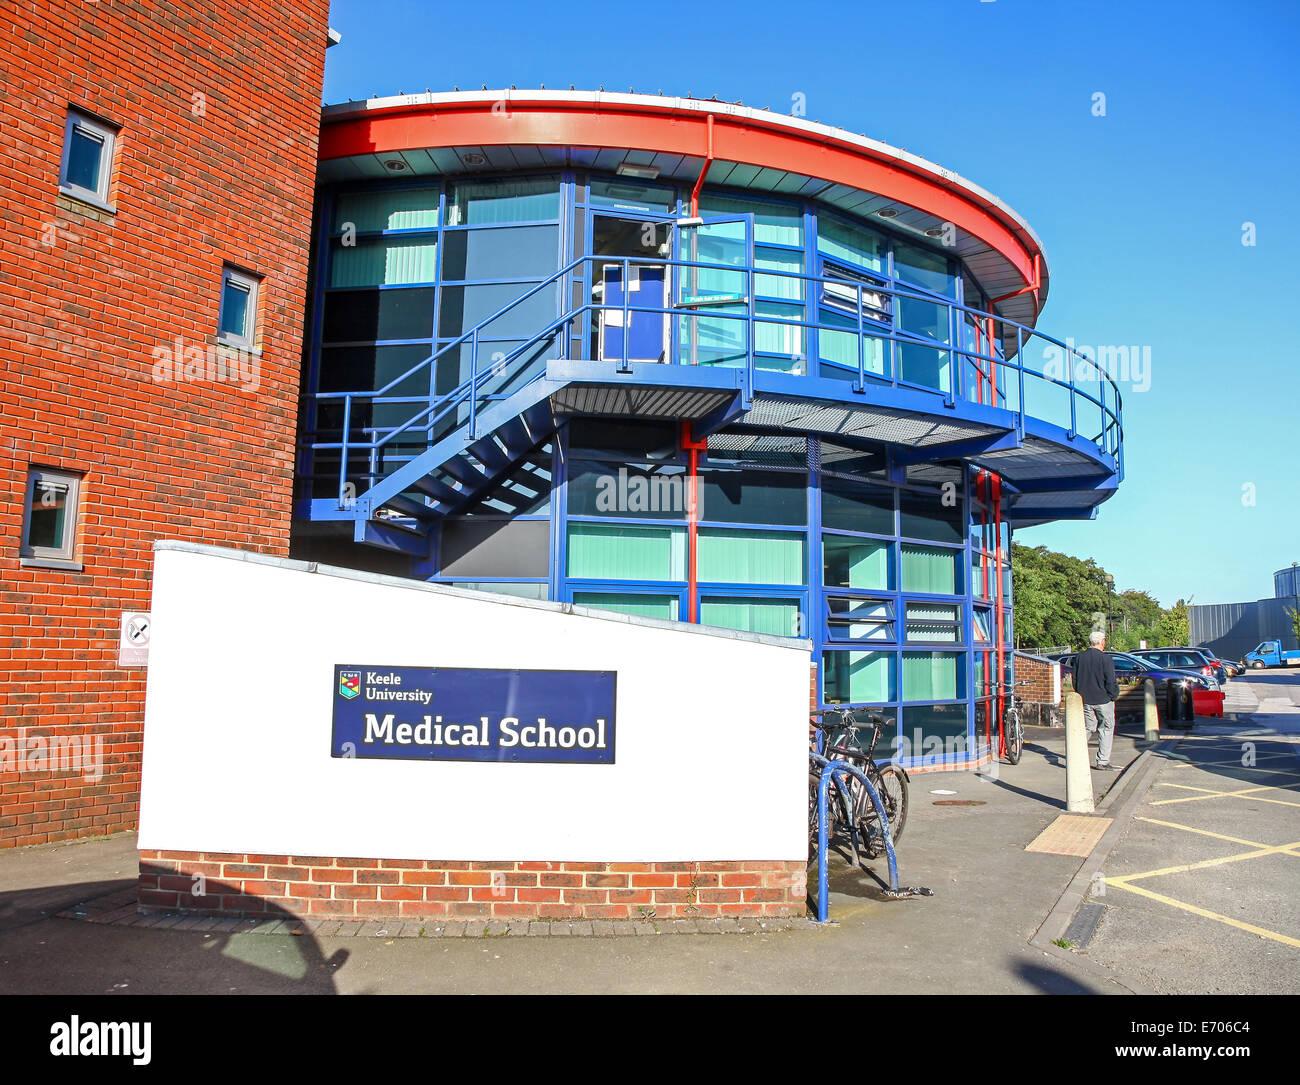 Keele University Medical School at The Royal Stoke University Hospital of North Staffordshire Stoke on Trent Staffs - Stock Image